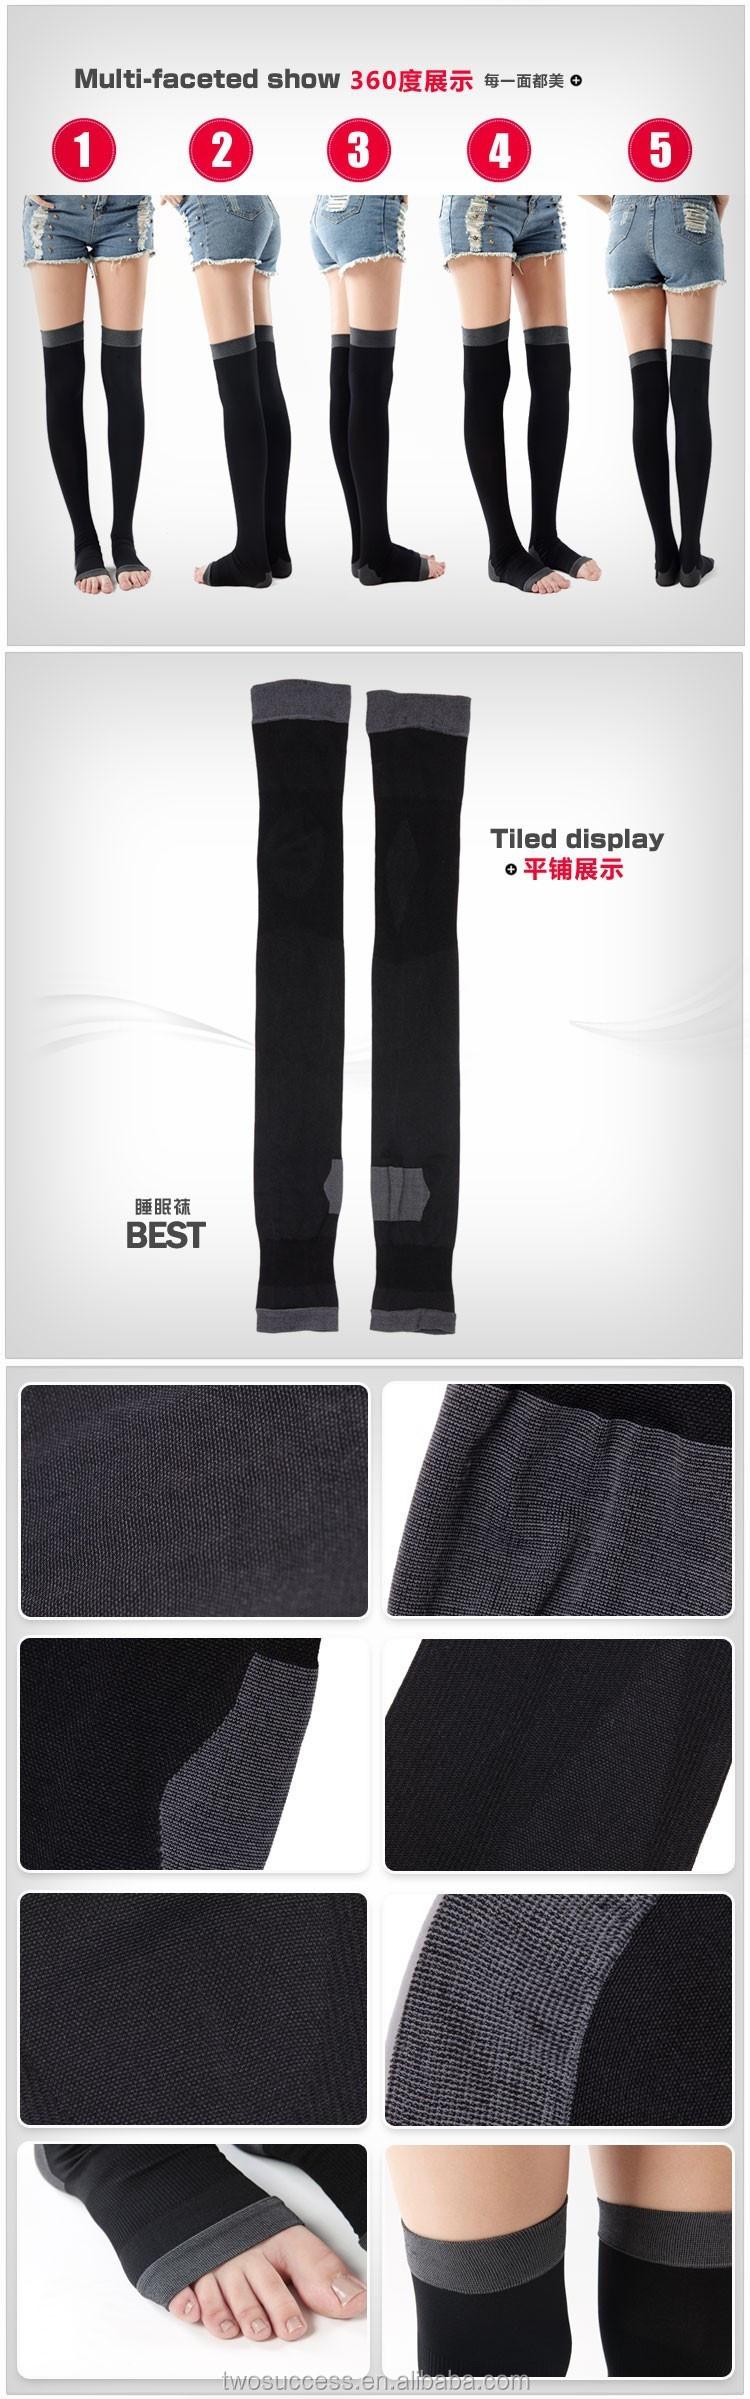 China socks factory bulk wholesale socks compression socks (2).jpg